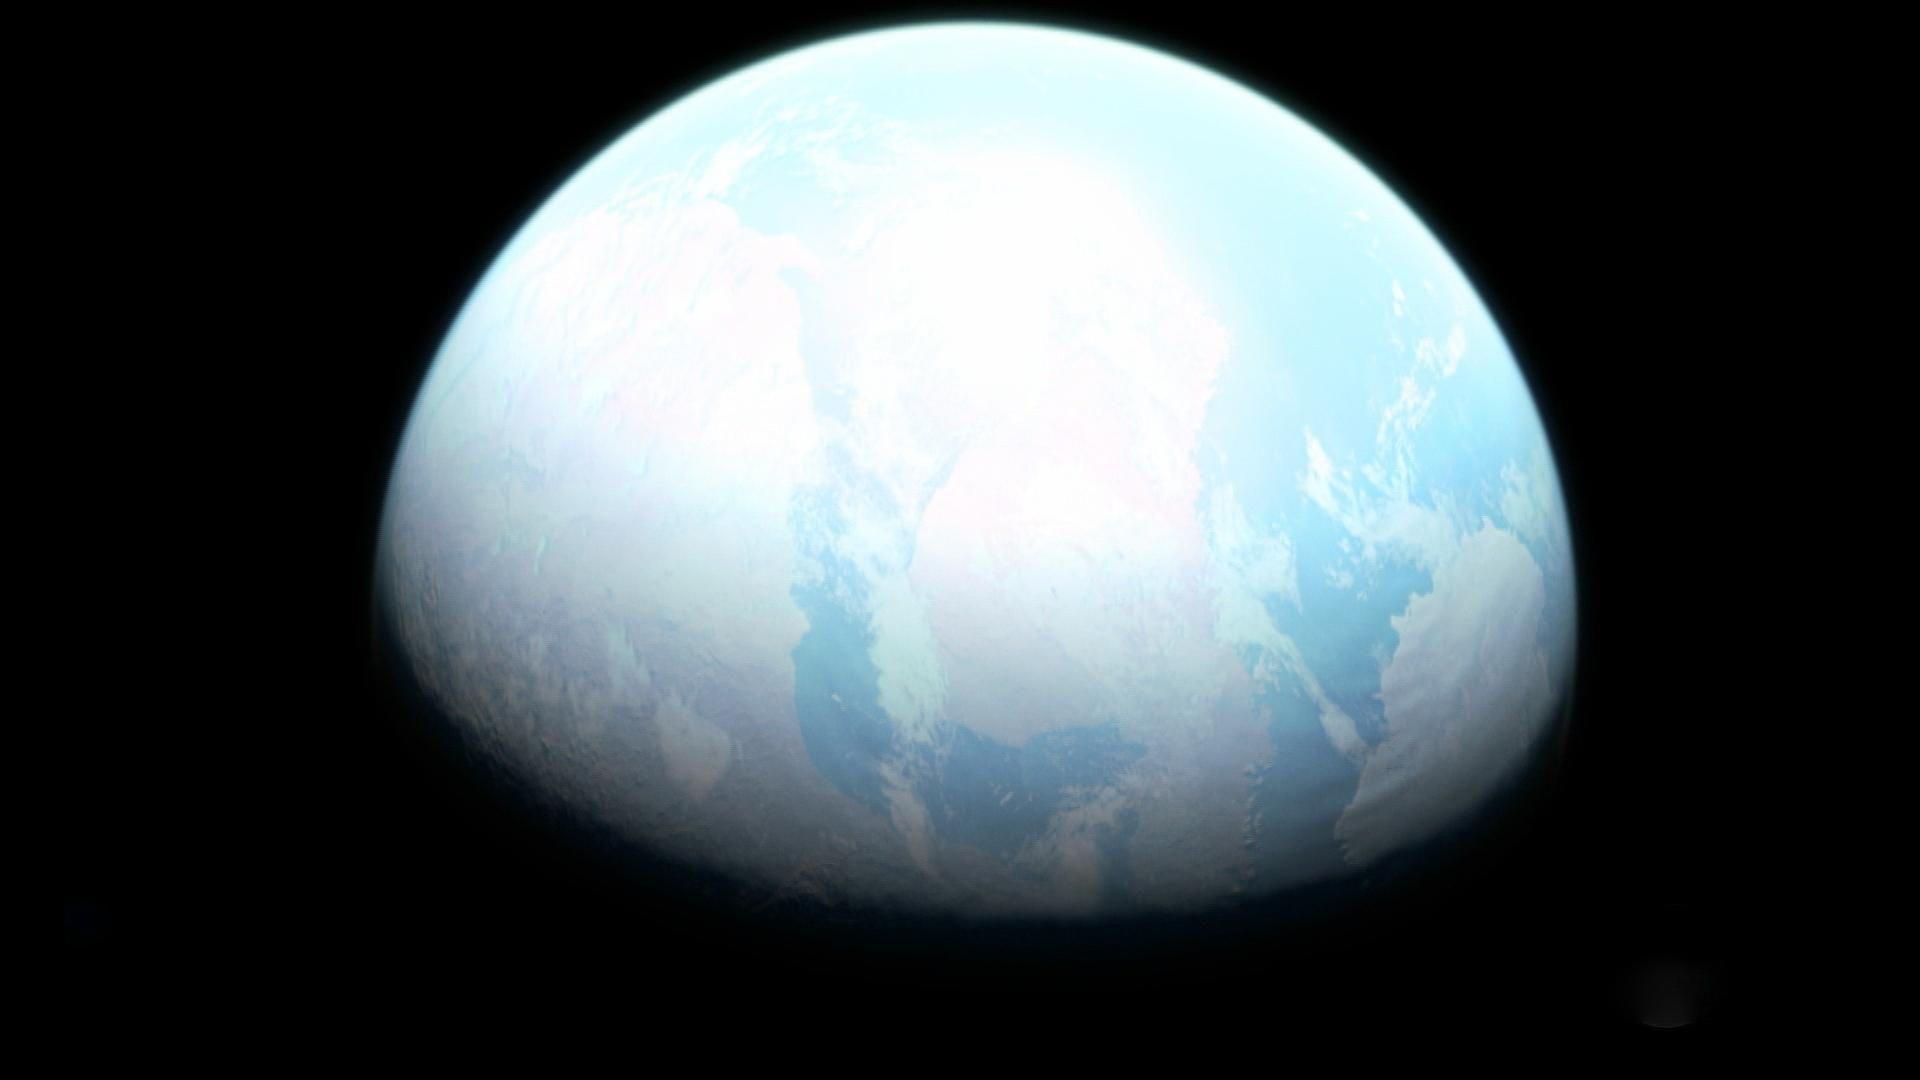 earth like planet found video - HD1920×1080